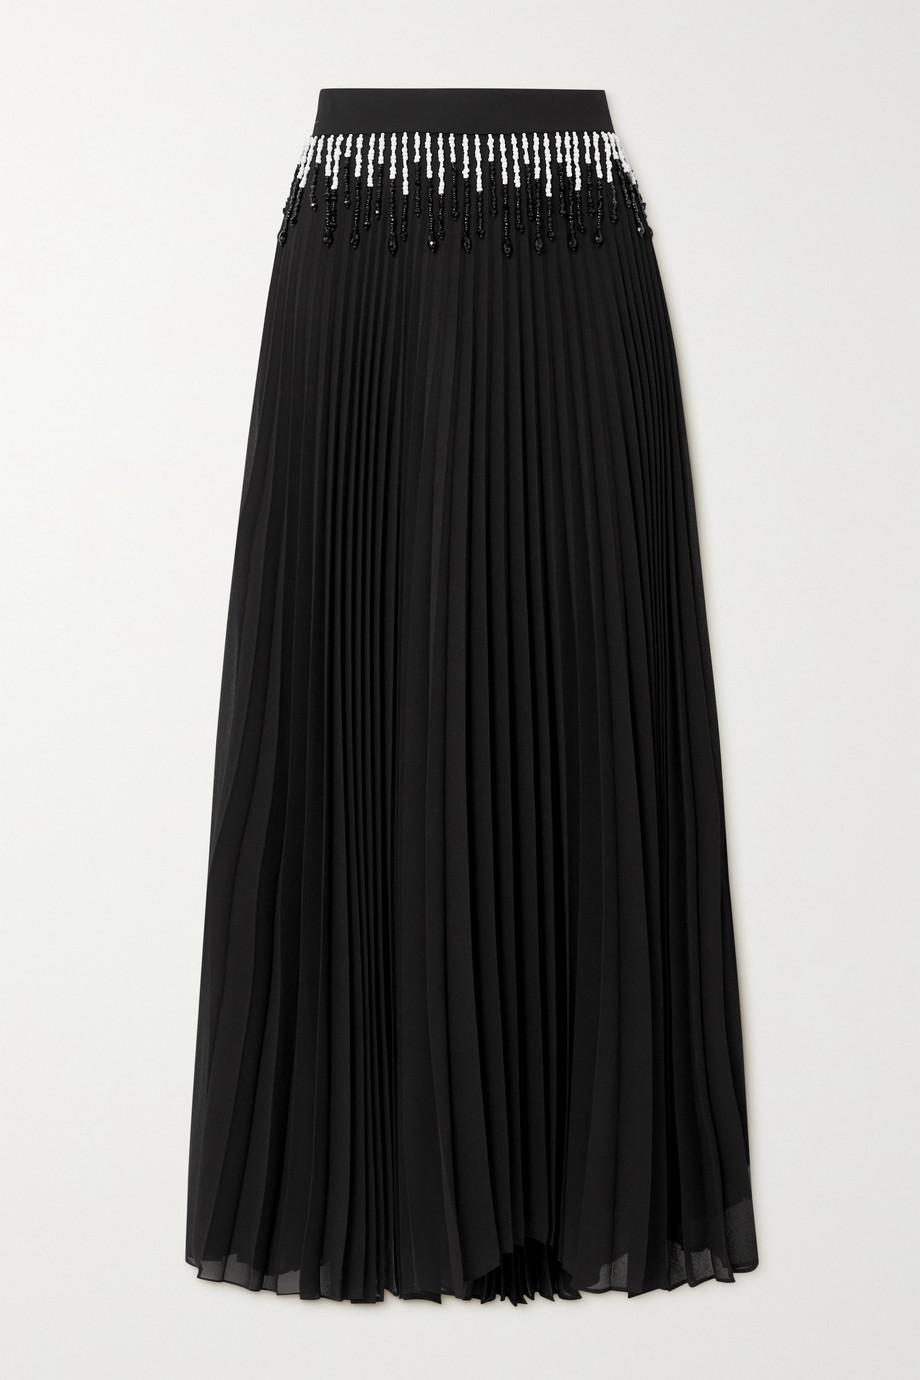 Christopher Kane Bead-embellished pleated crepe maxi skirt